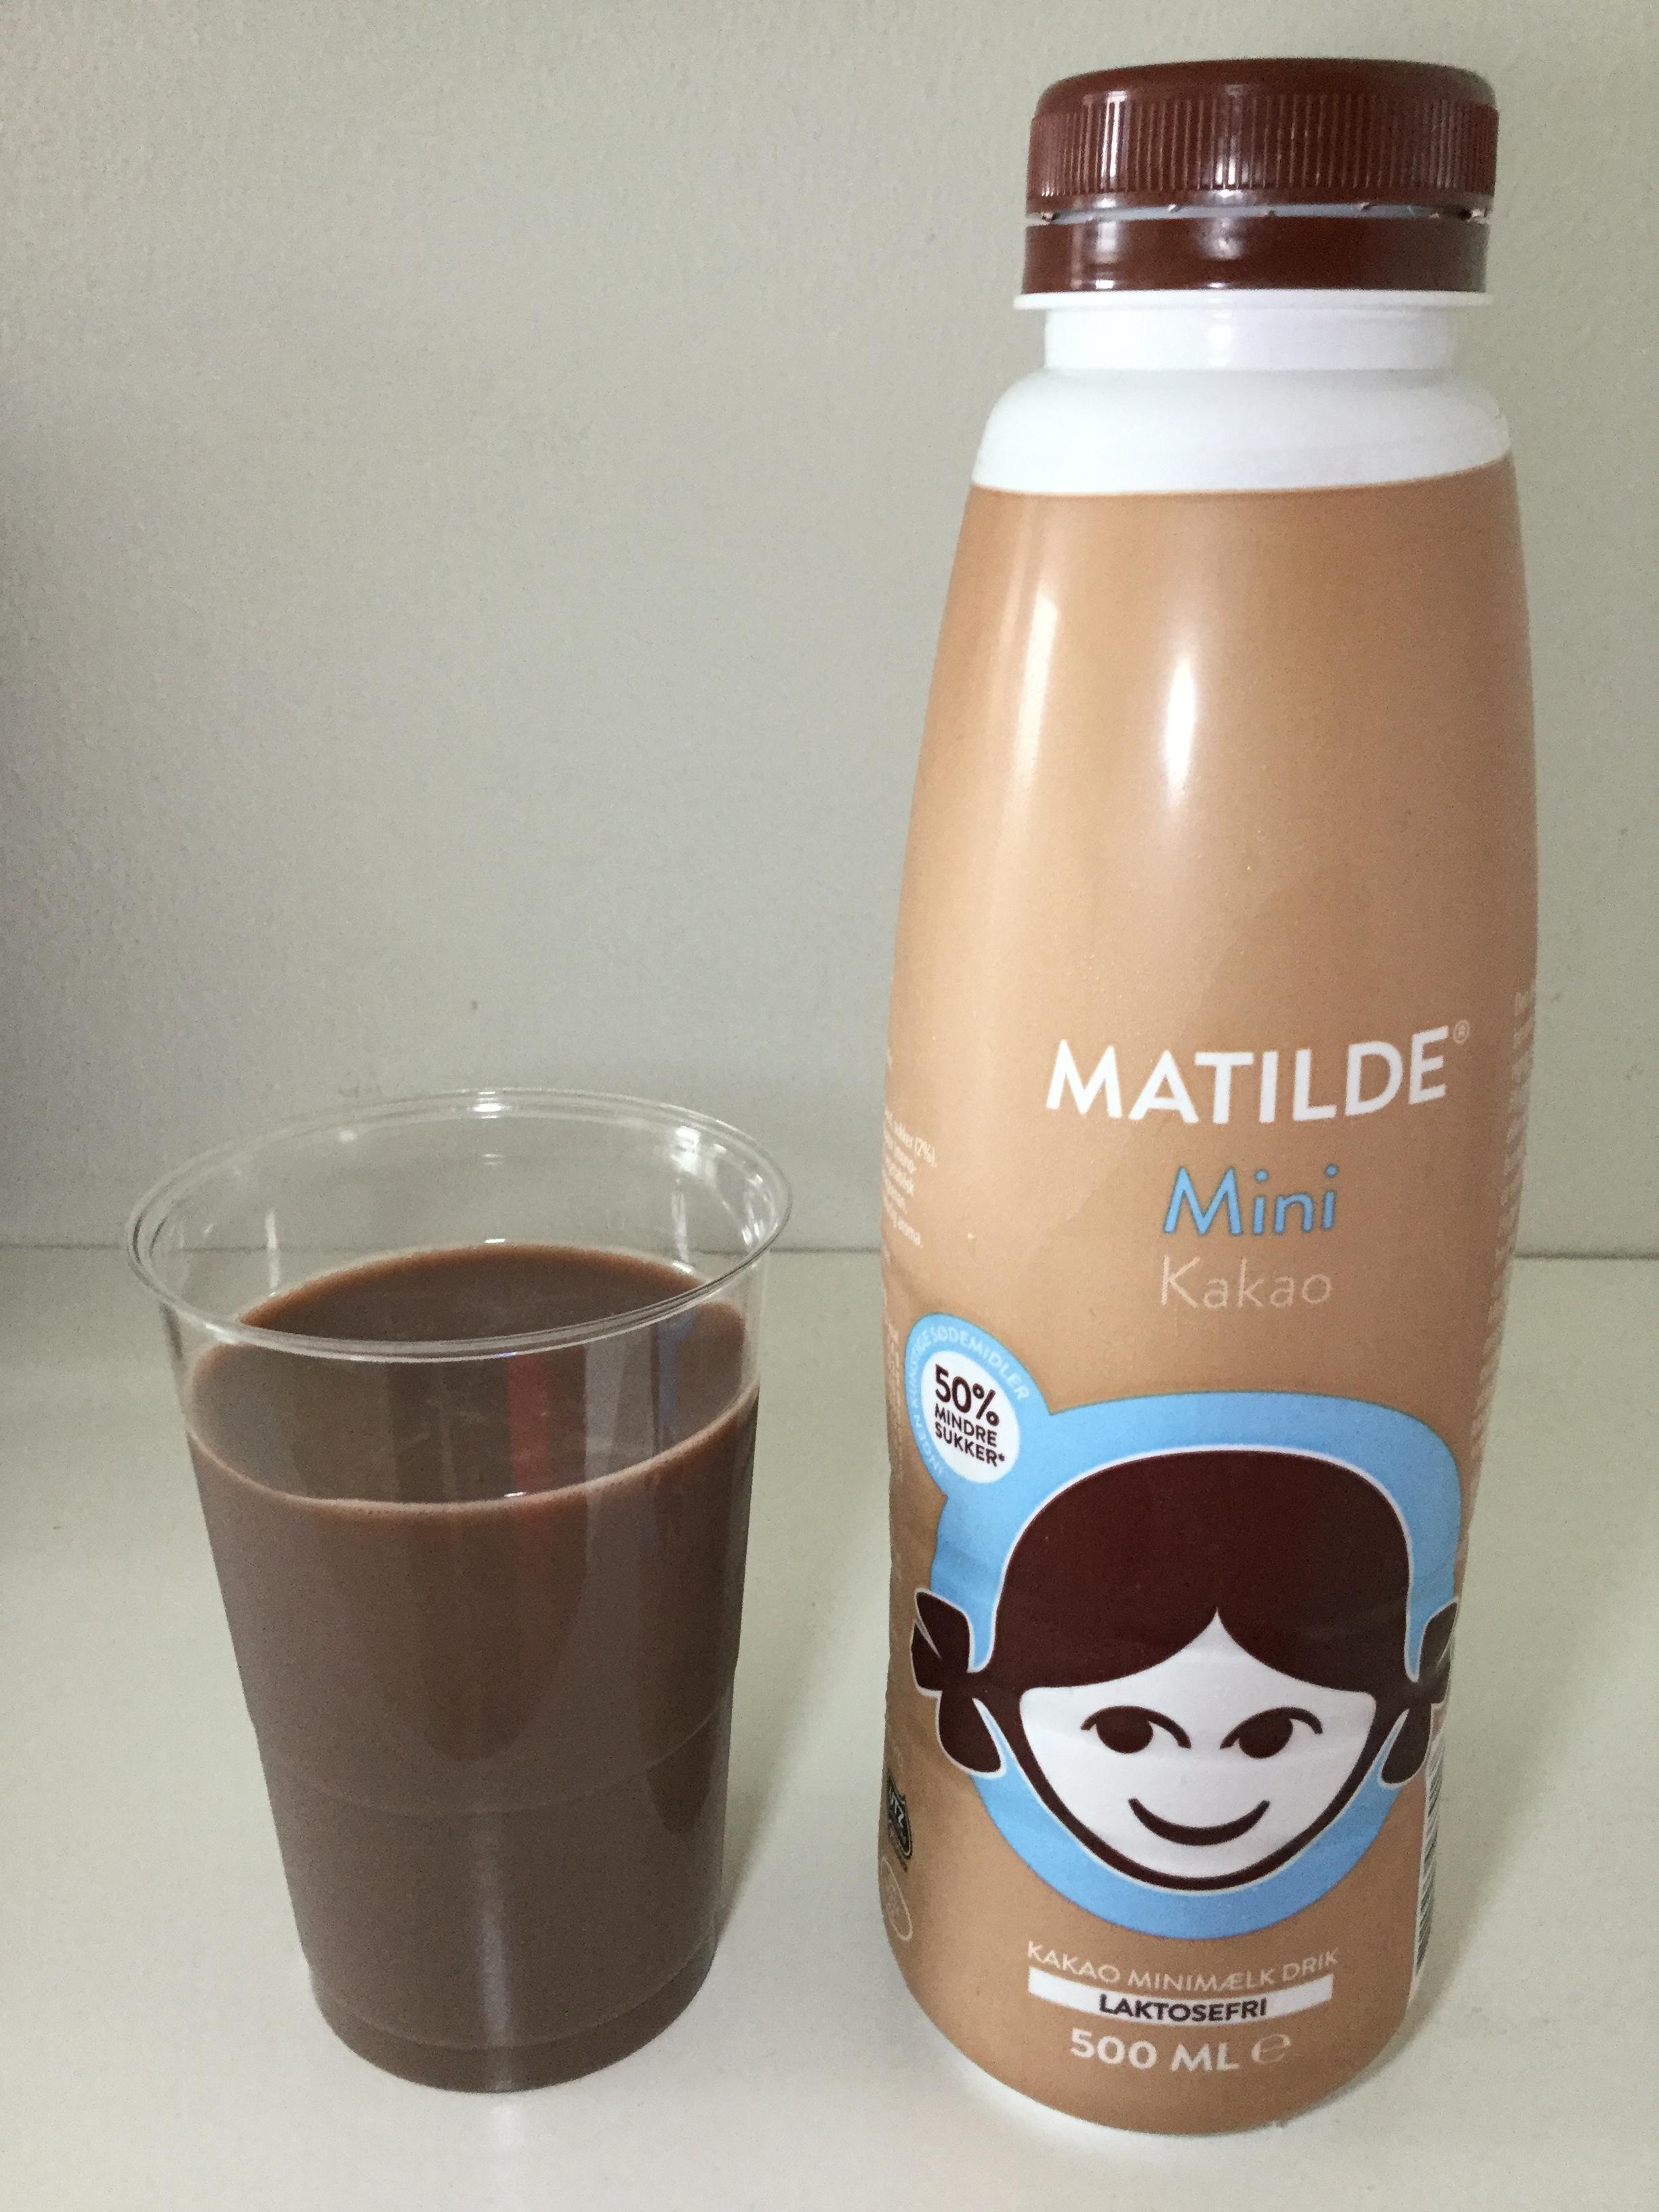 Matilde Mini Kakao Laktosfri Cup